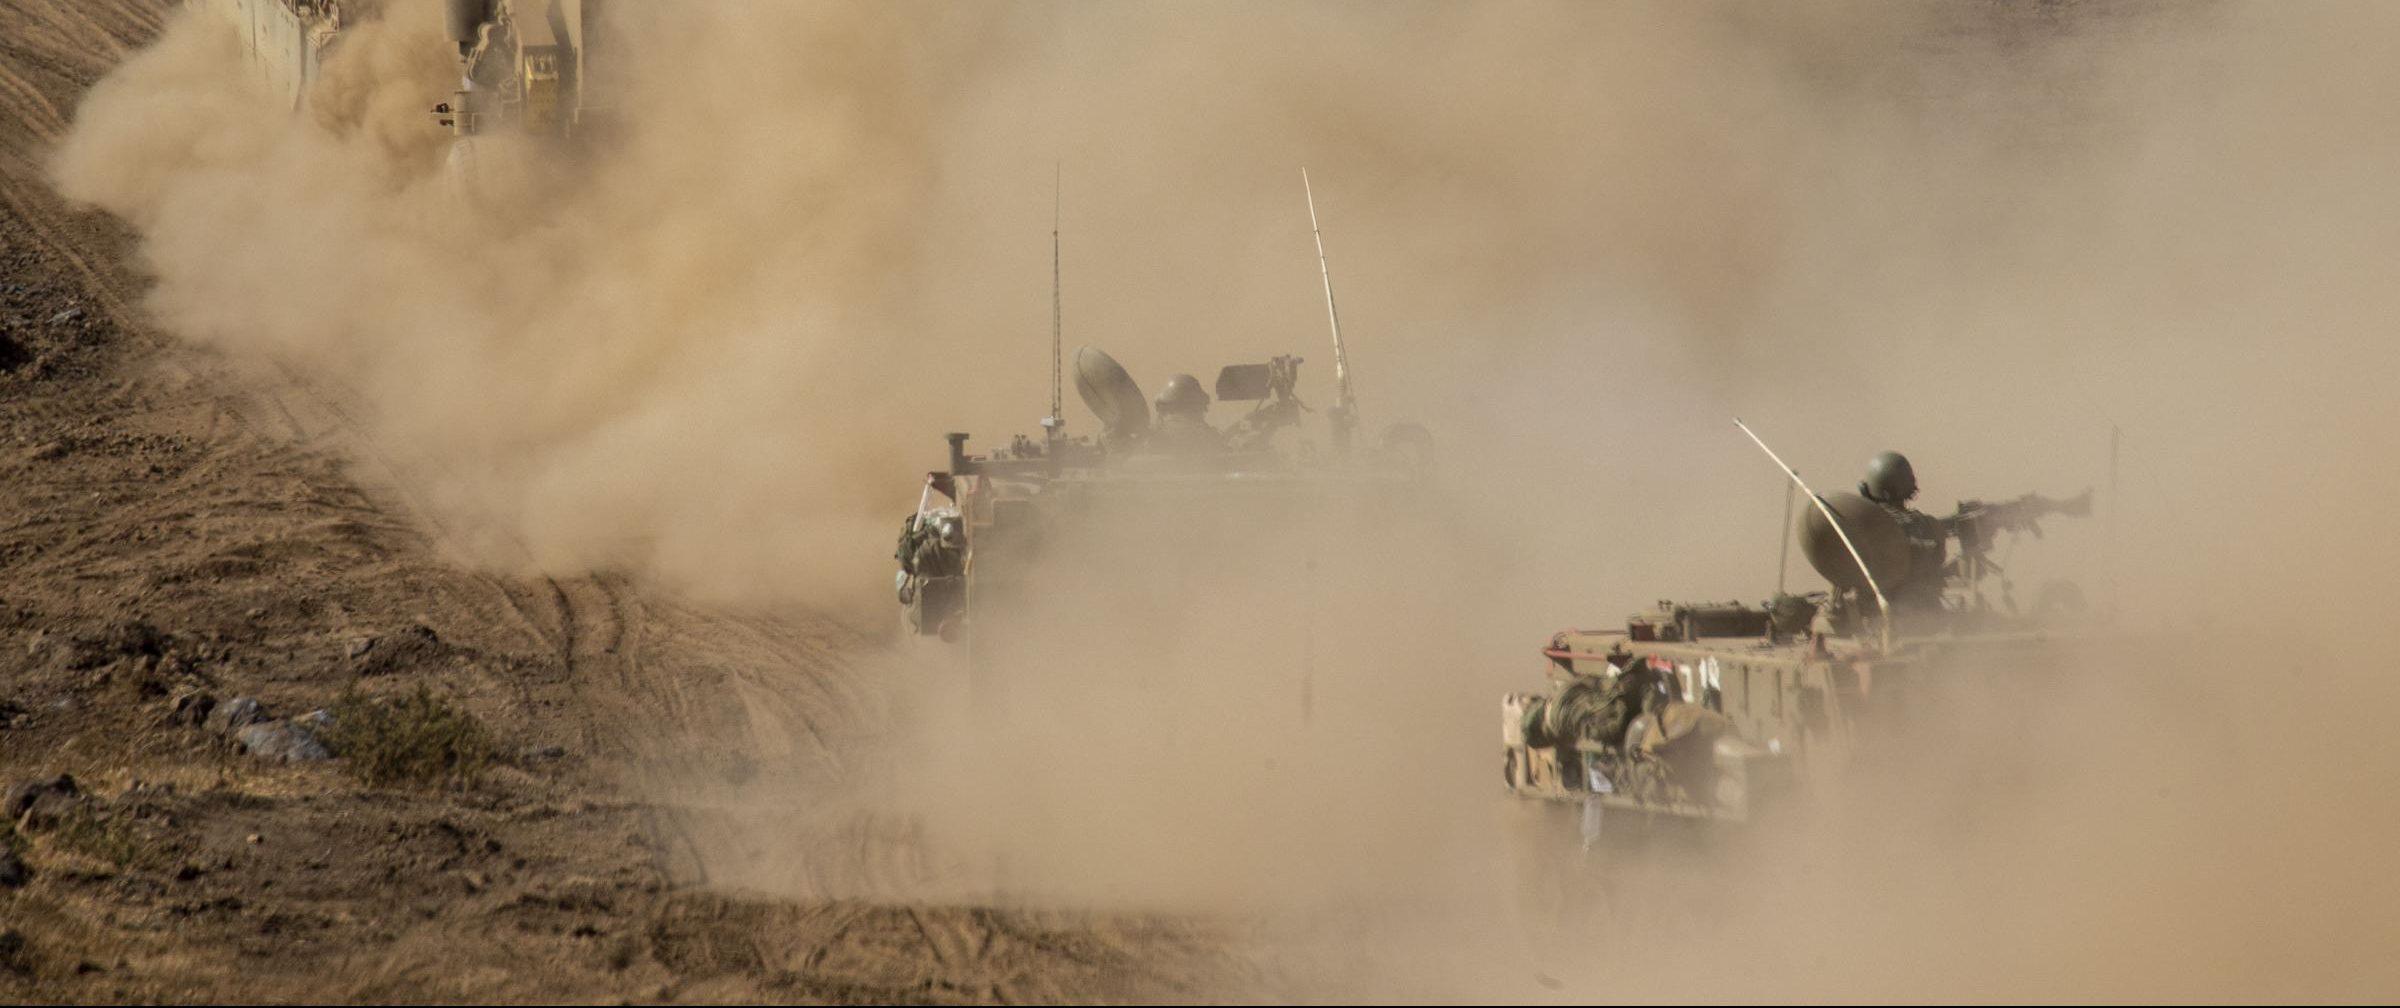 La guerra tra Israele ed Hezbollah del 2006